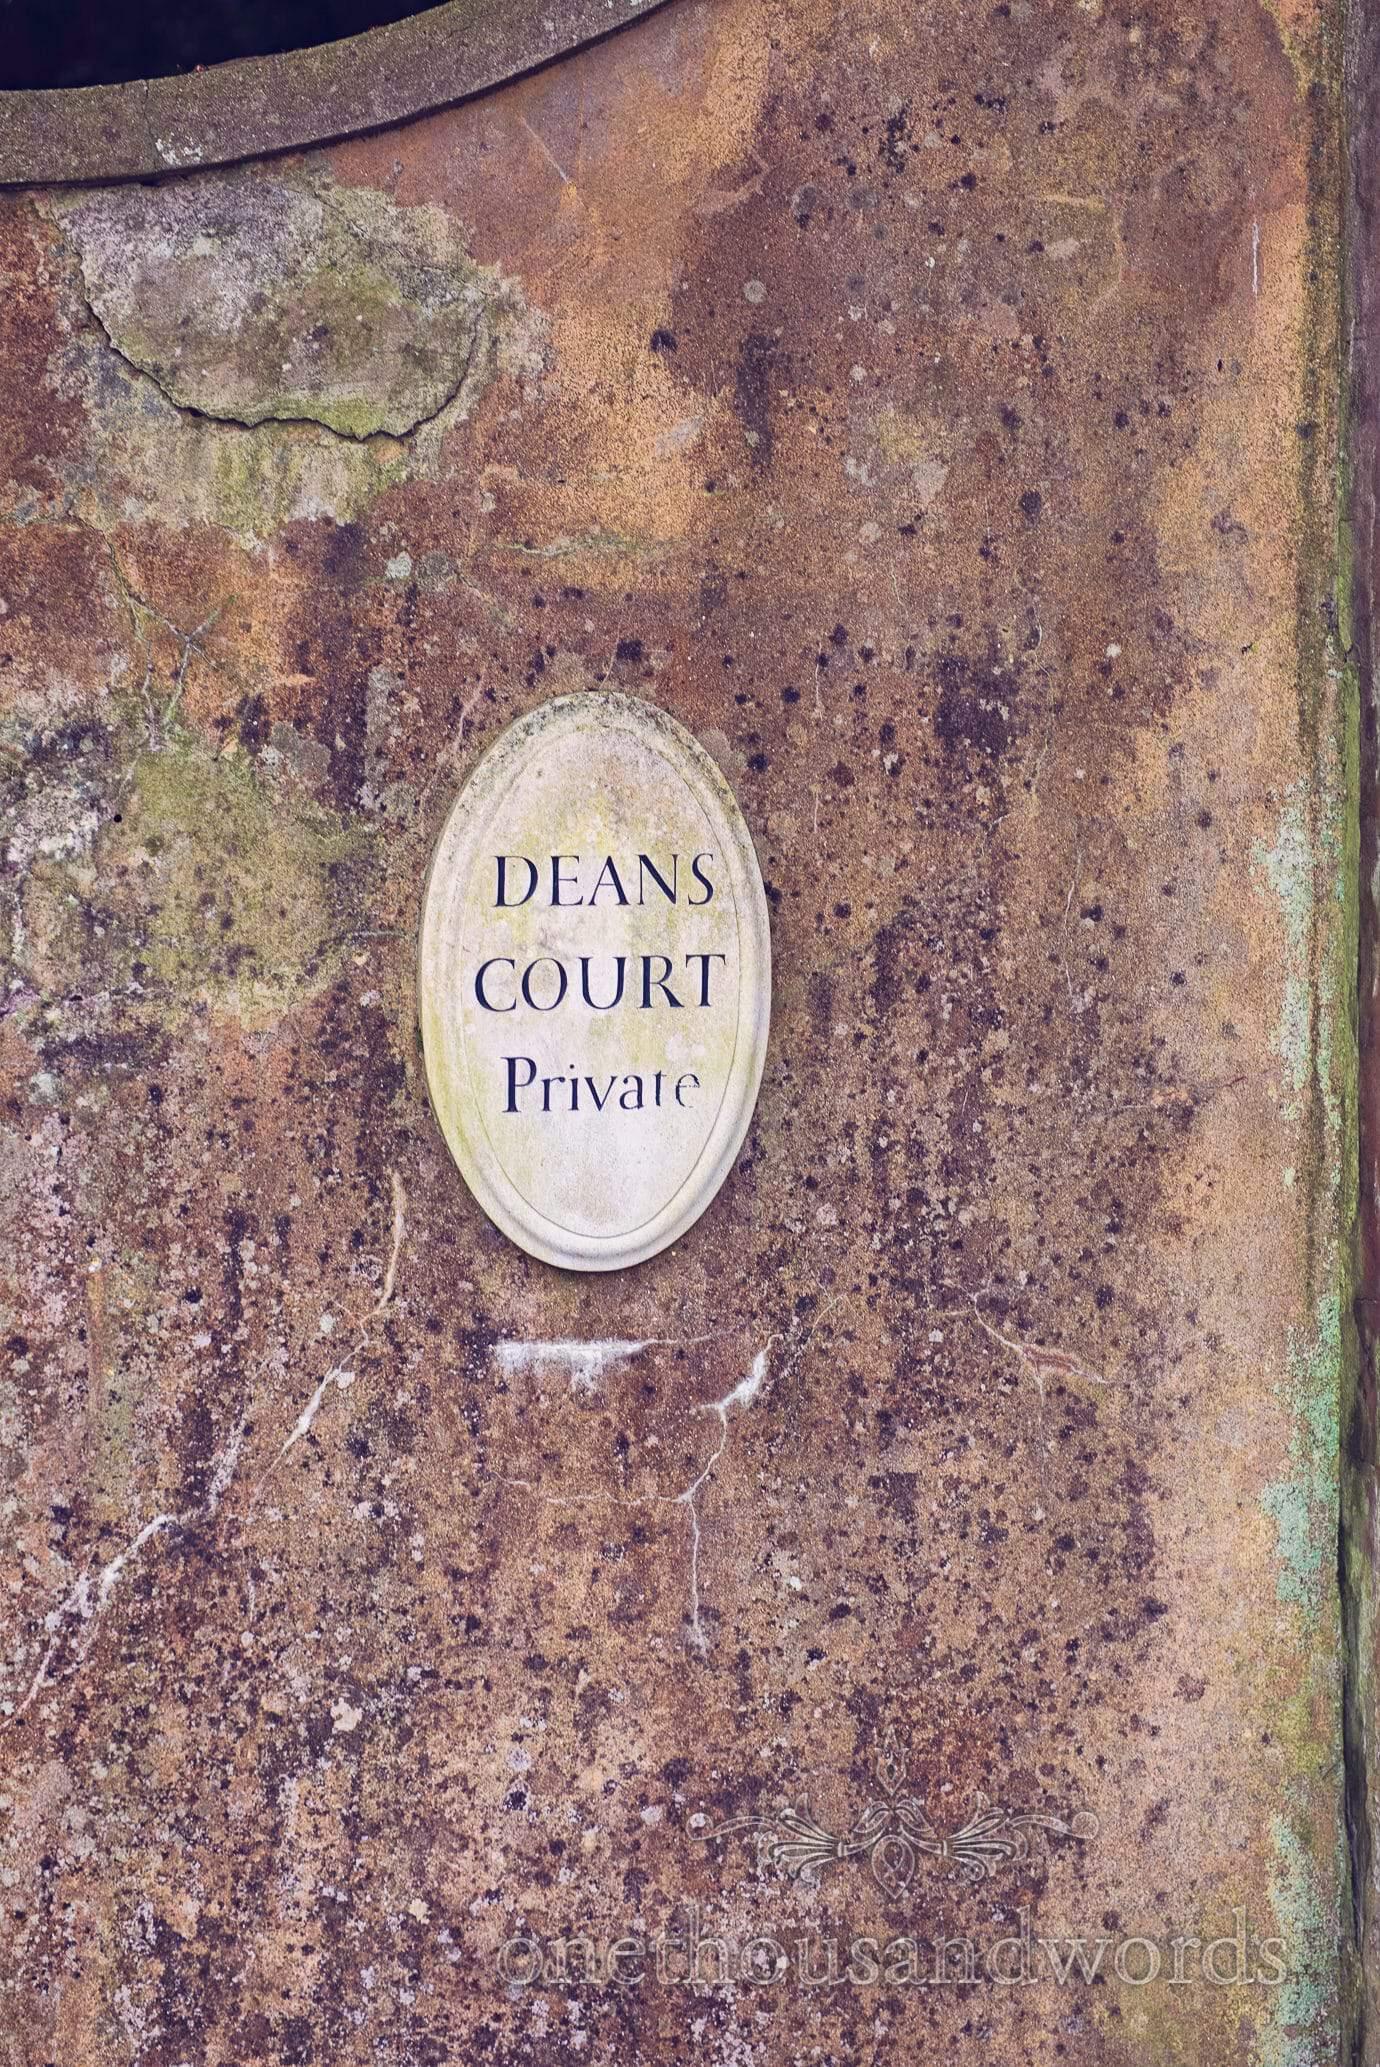 Deans Court Wedding Venue sign in Wimborne, Dorset